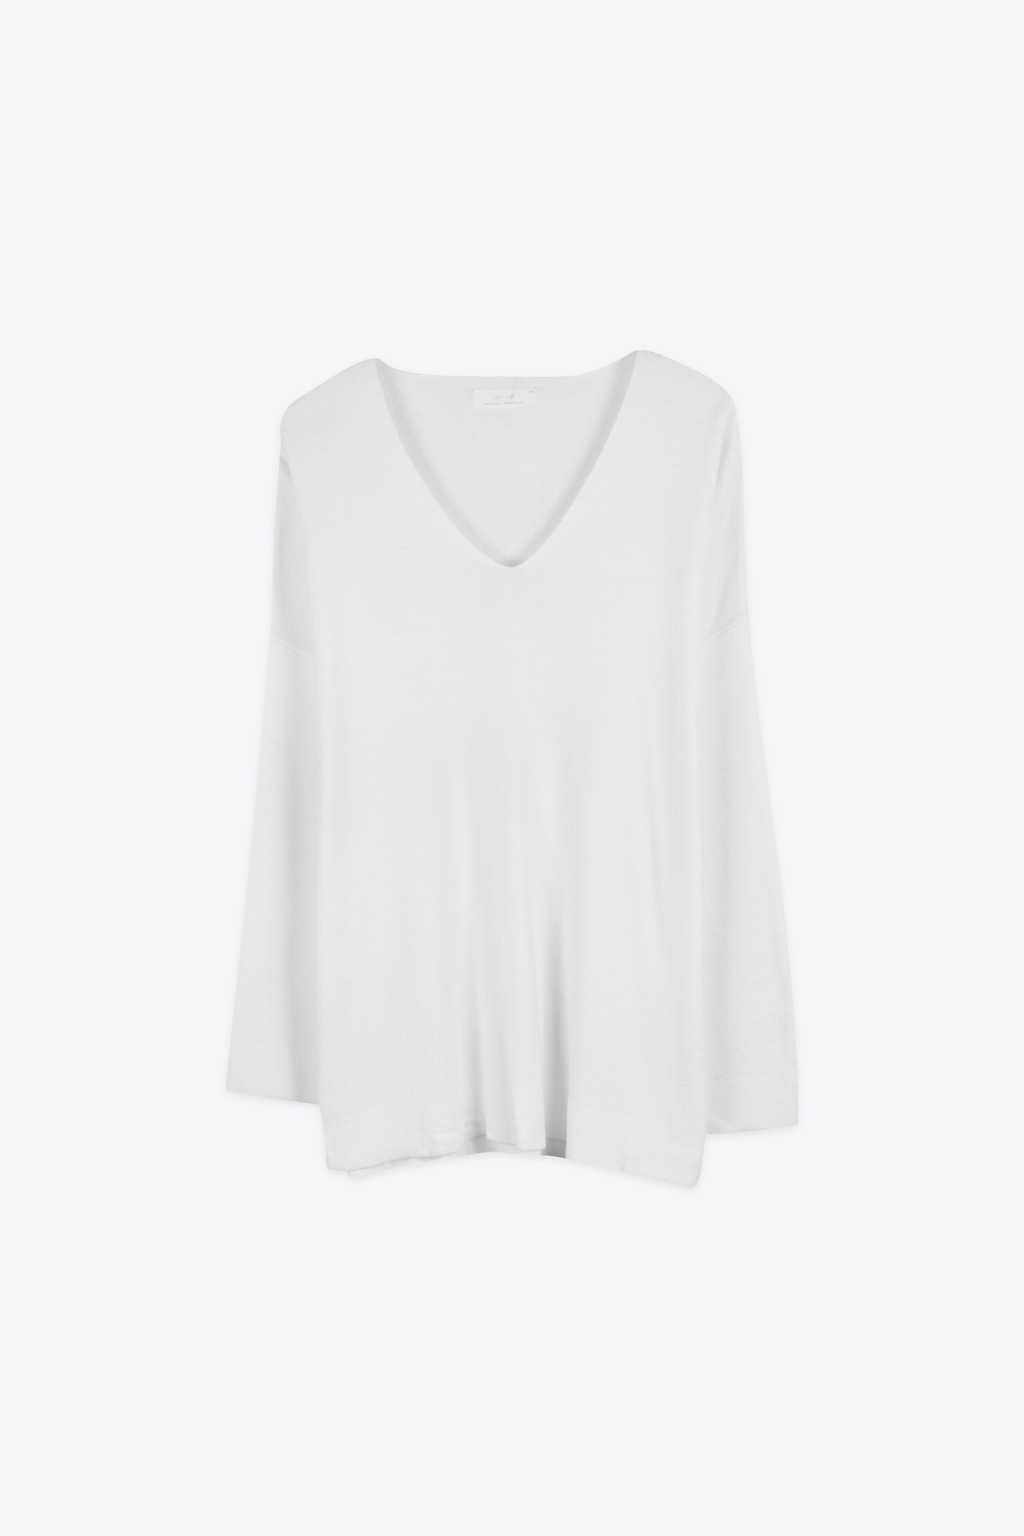 Sweater 1468 White 5